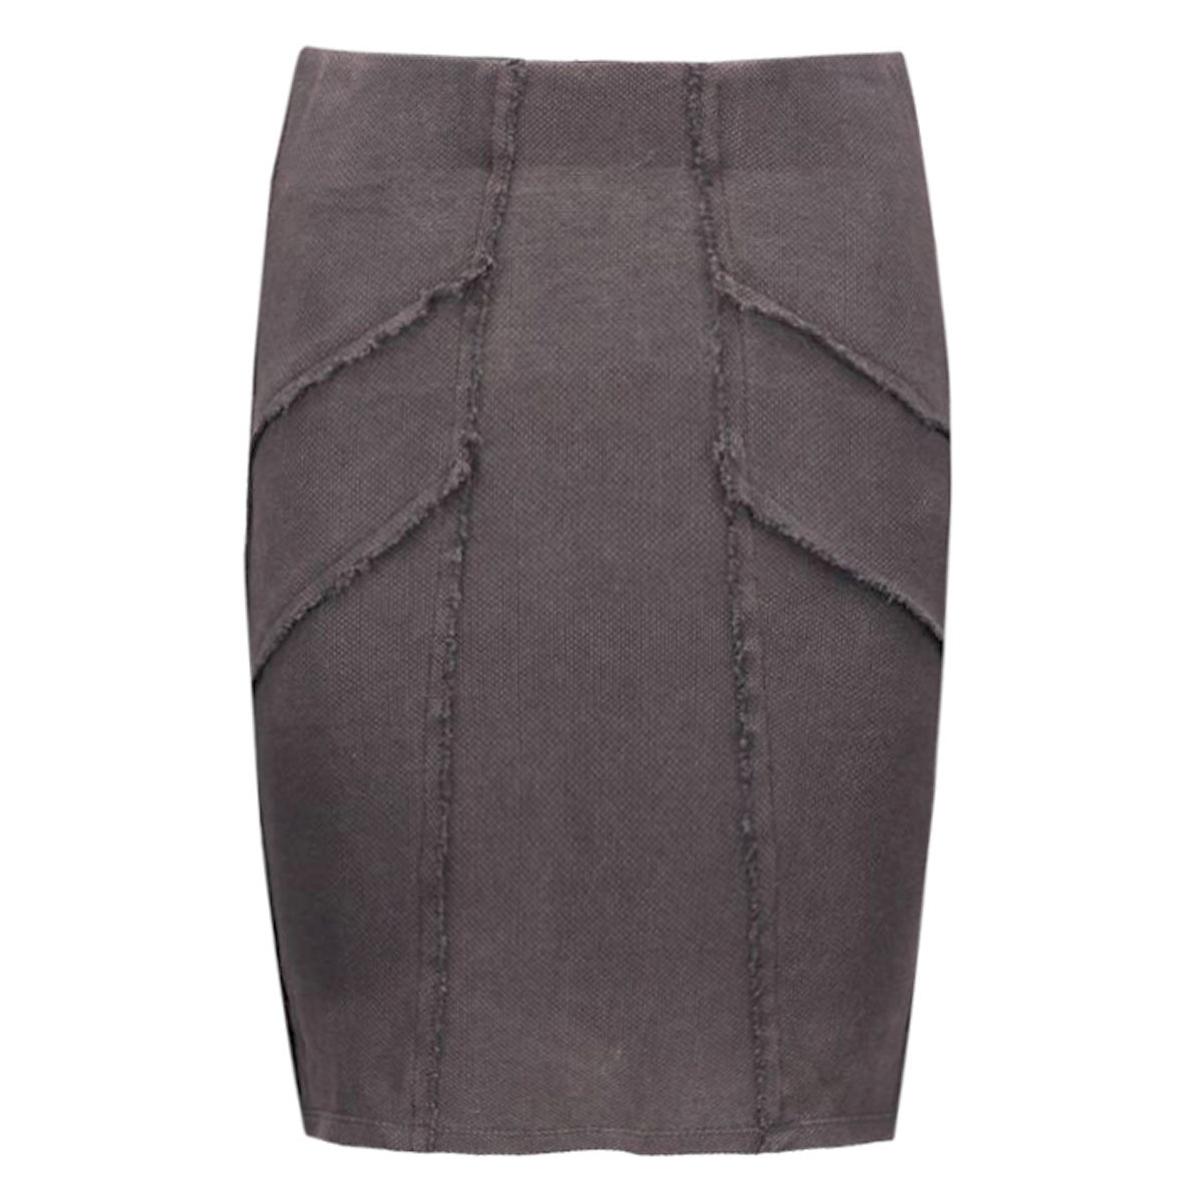 objsine mw pencil skirt 87 23023102 object rok anthracite